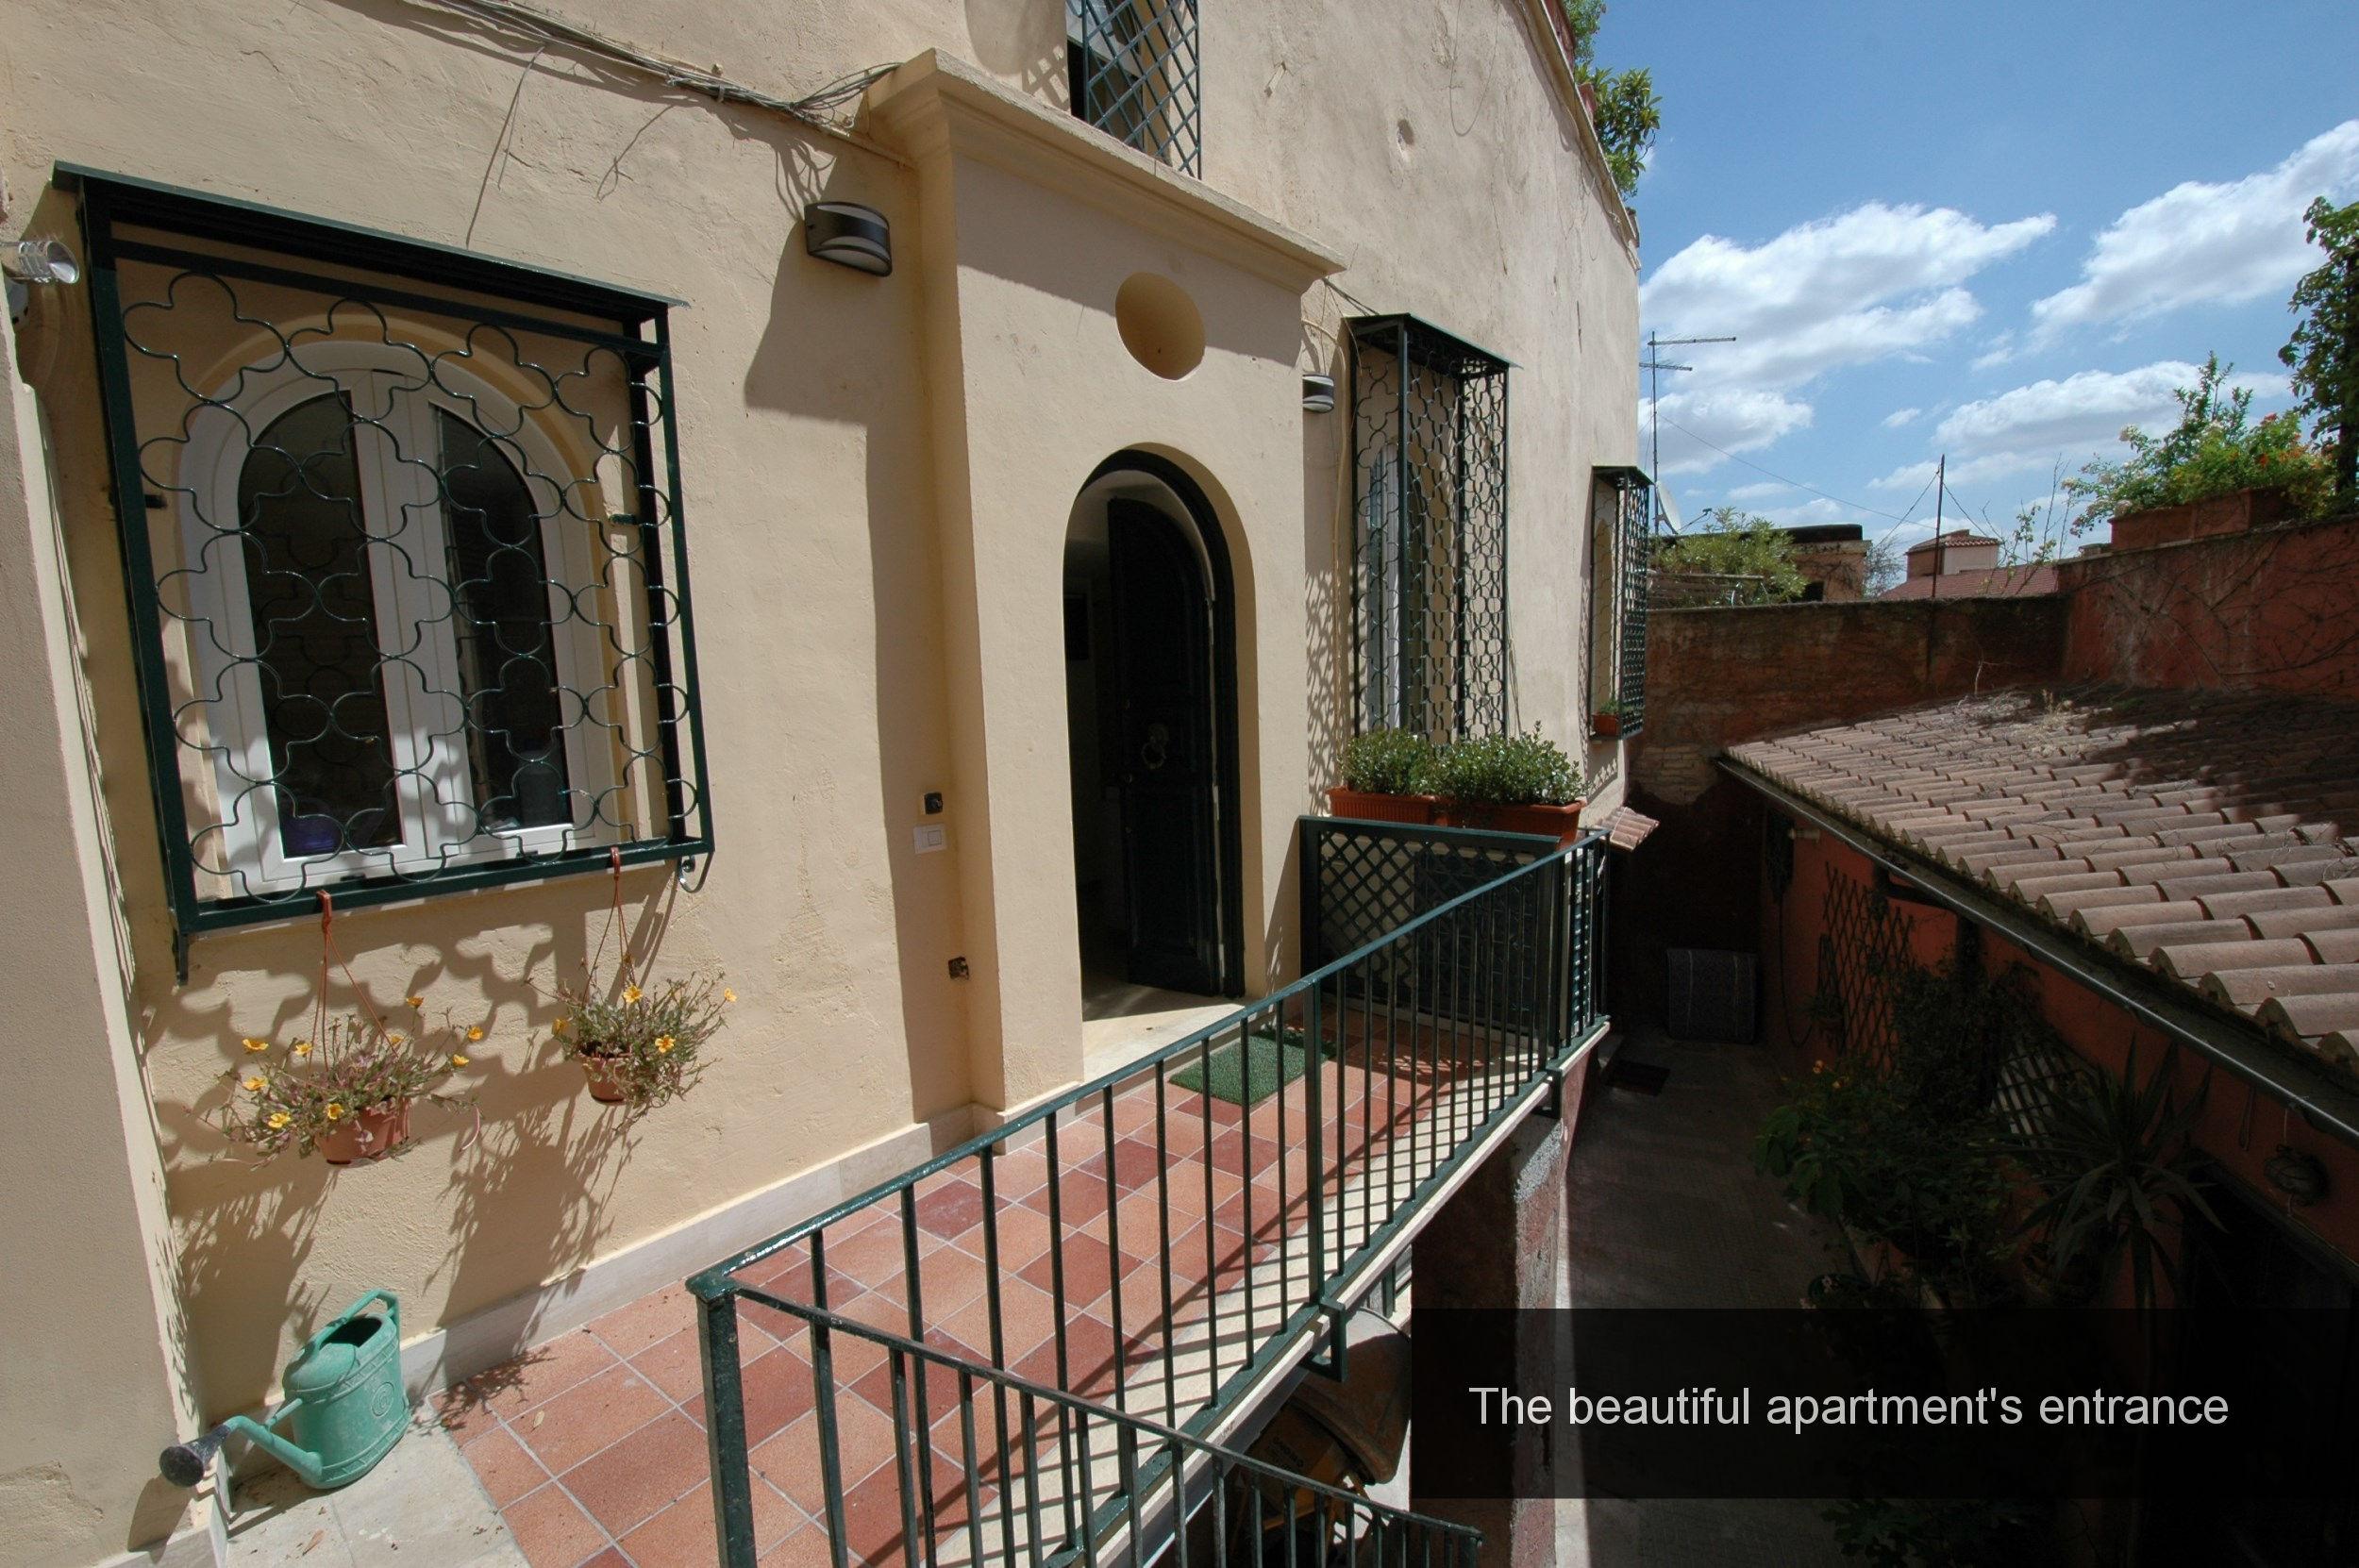 2) beautiful apartment entrance